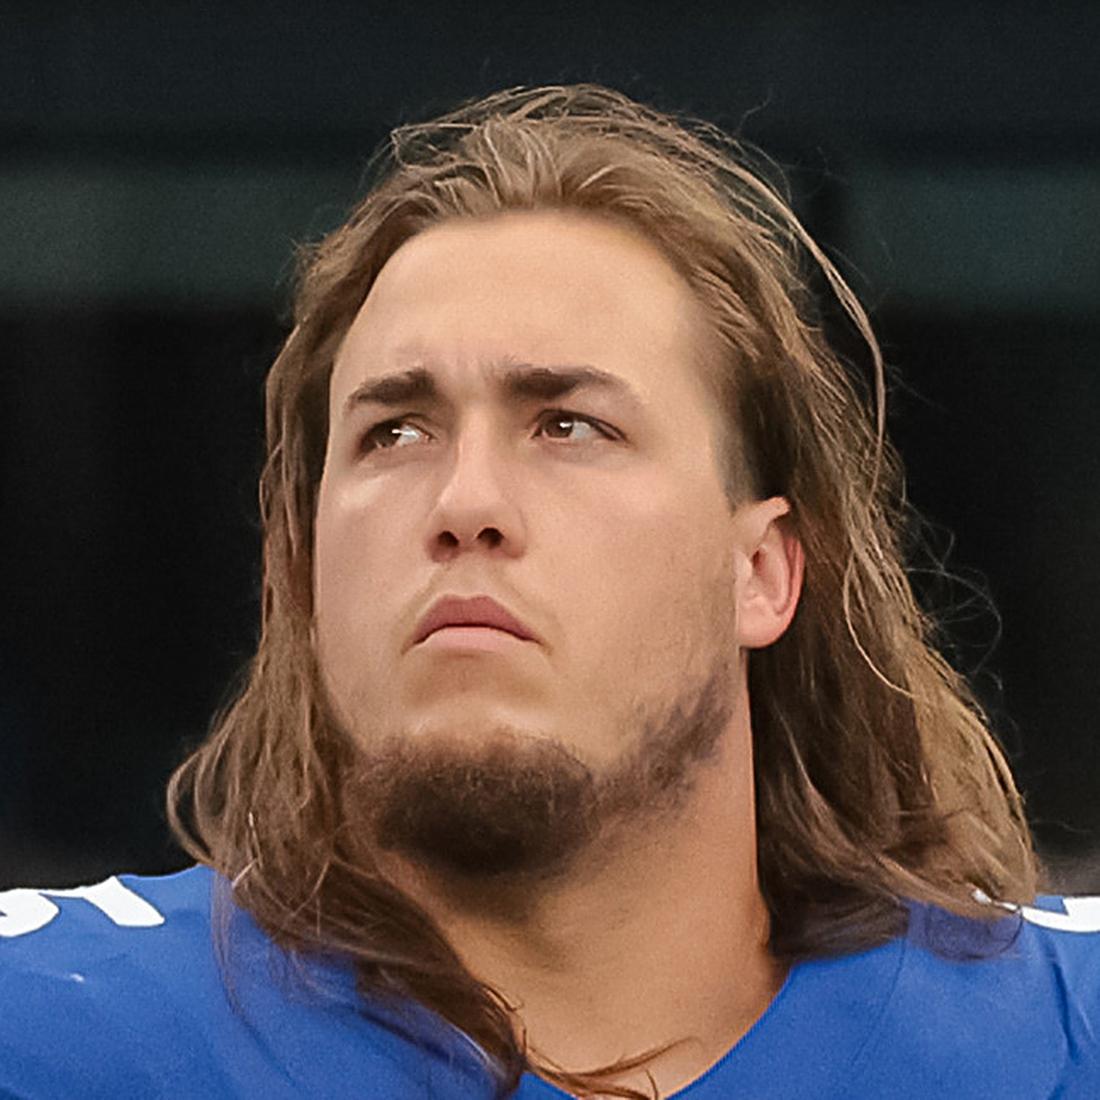 New York Giants NFL center Nick Gates